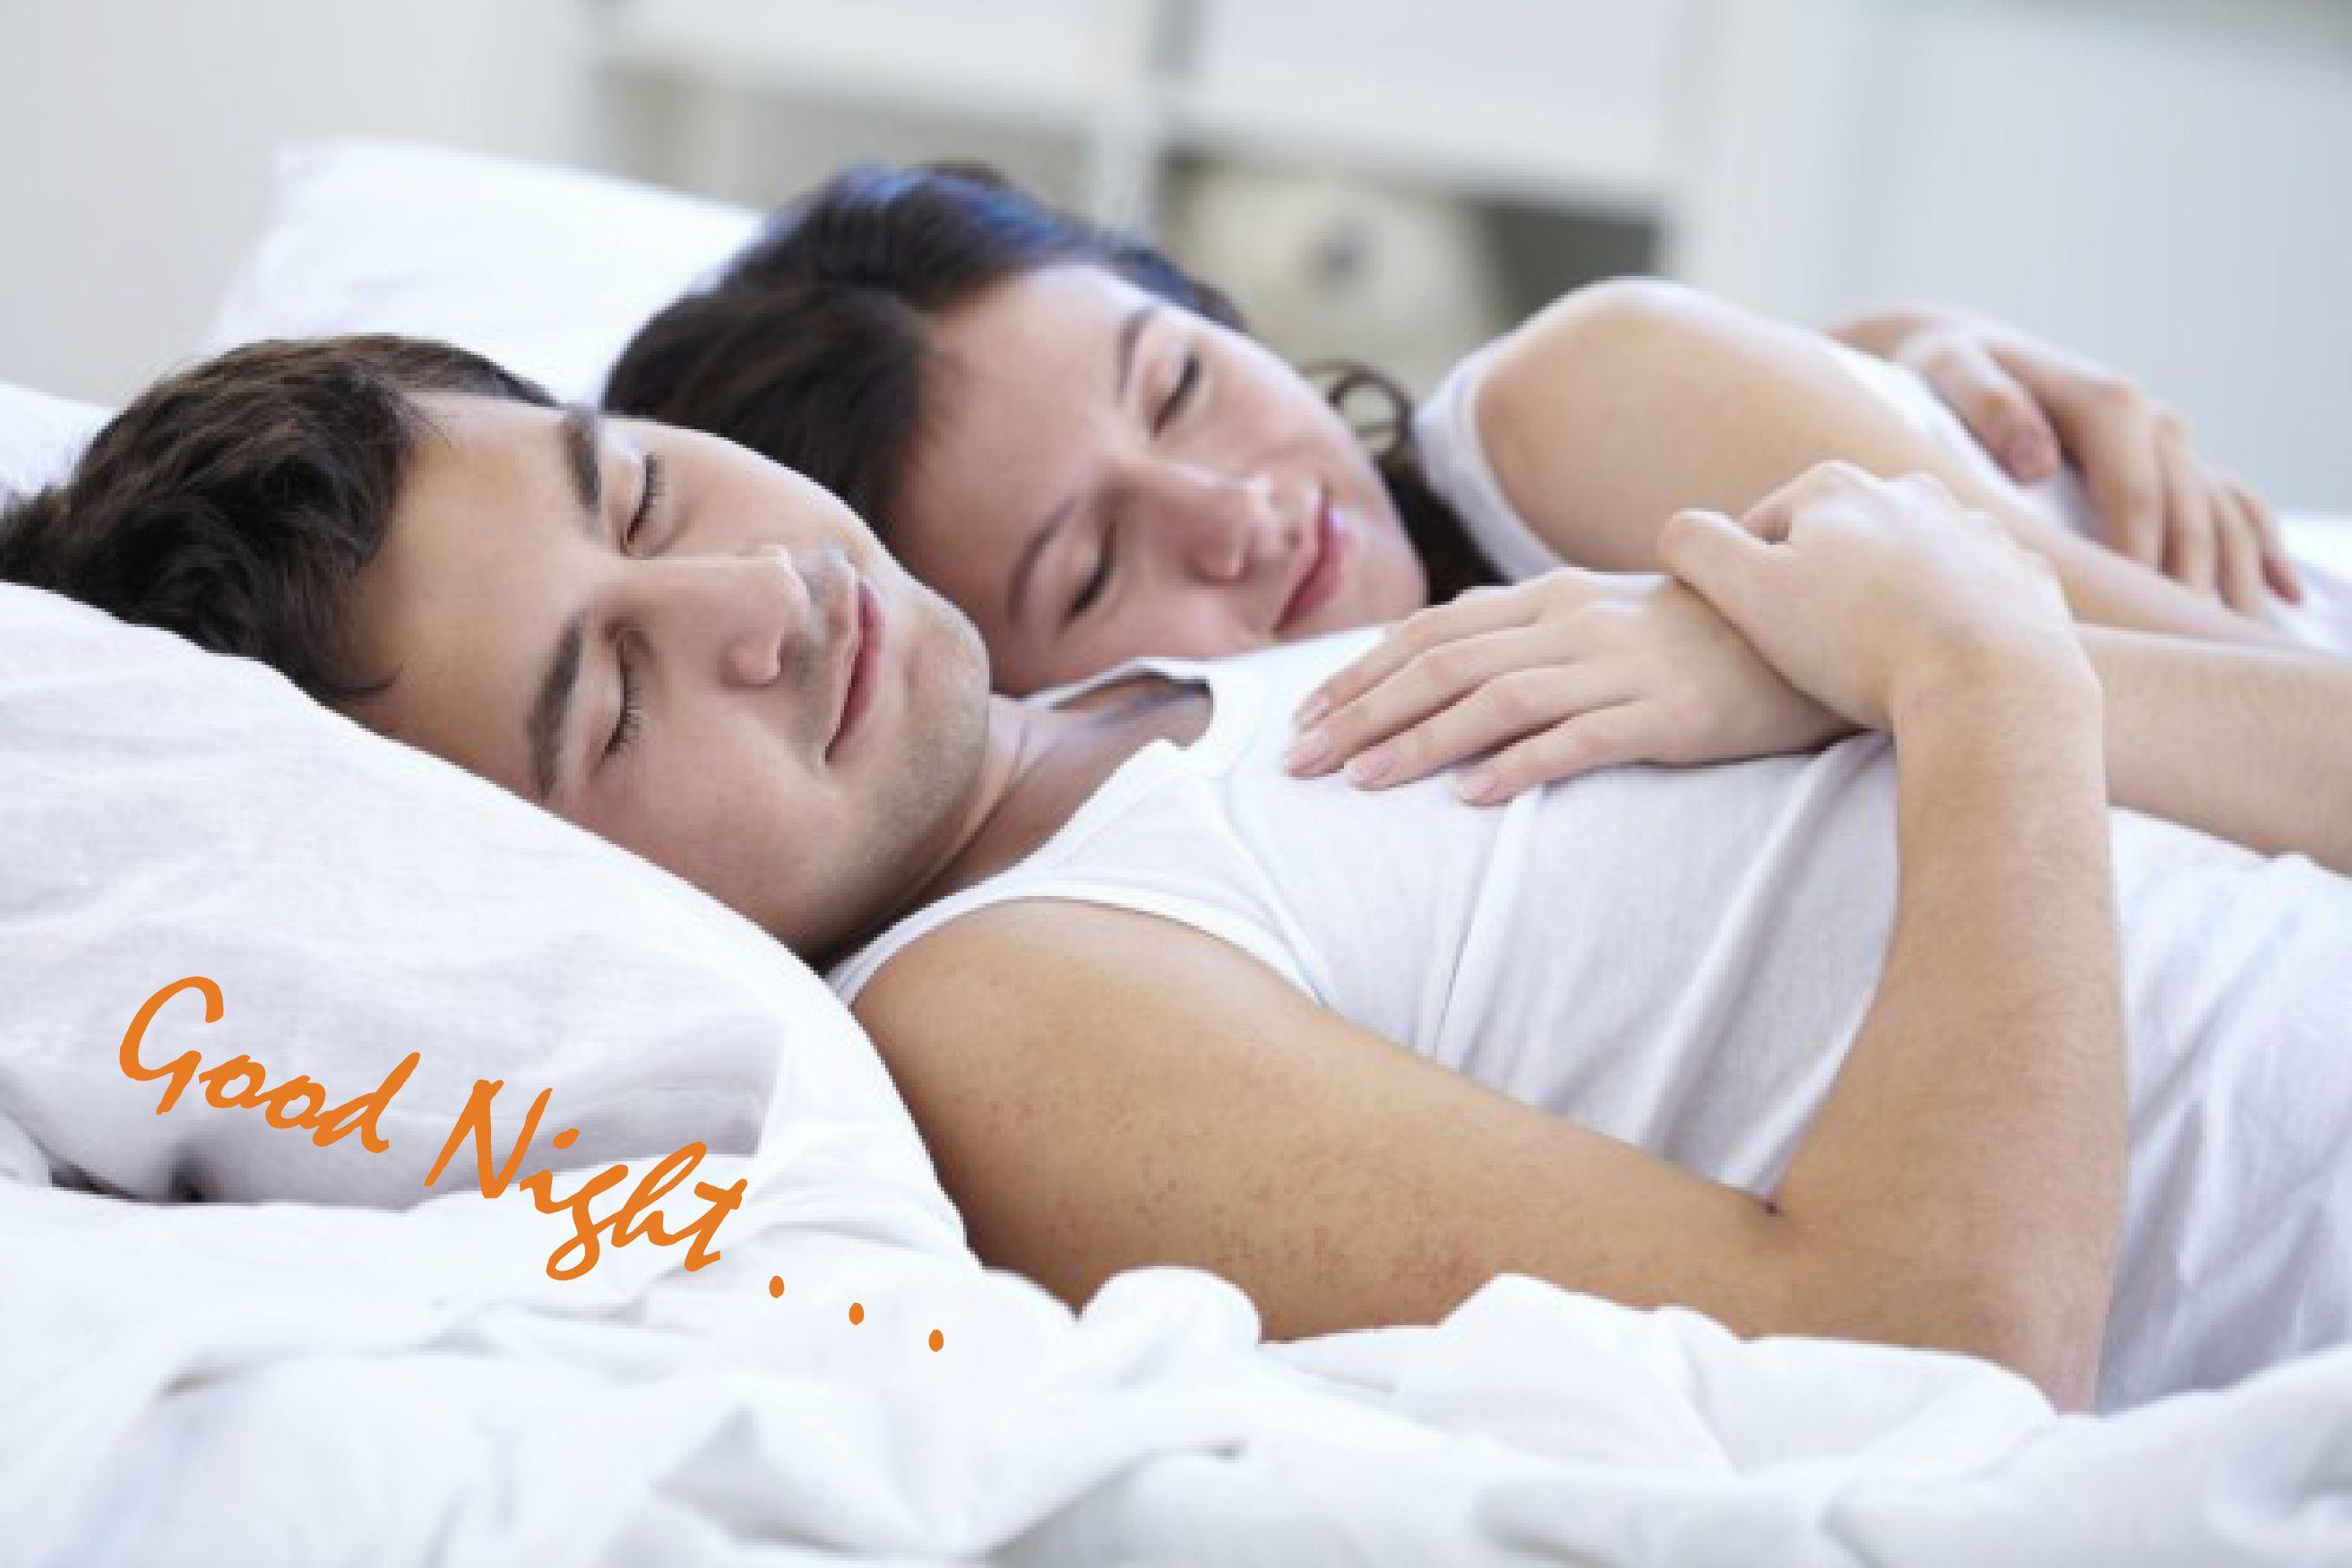 Romantic Couple Images Good Night